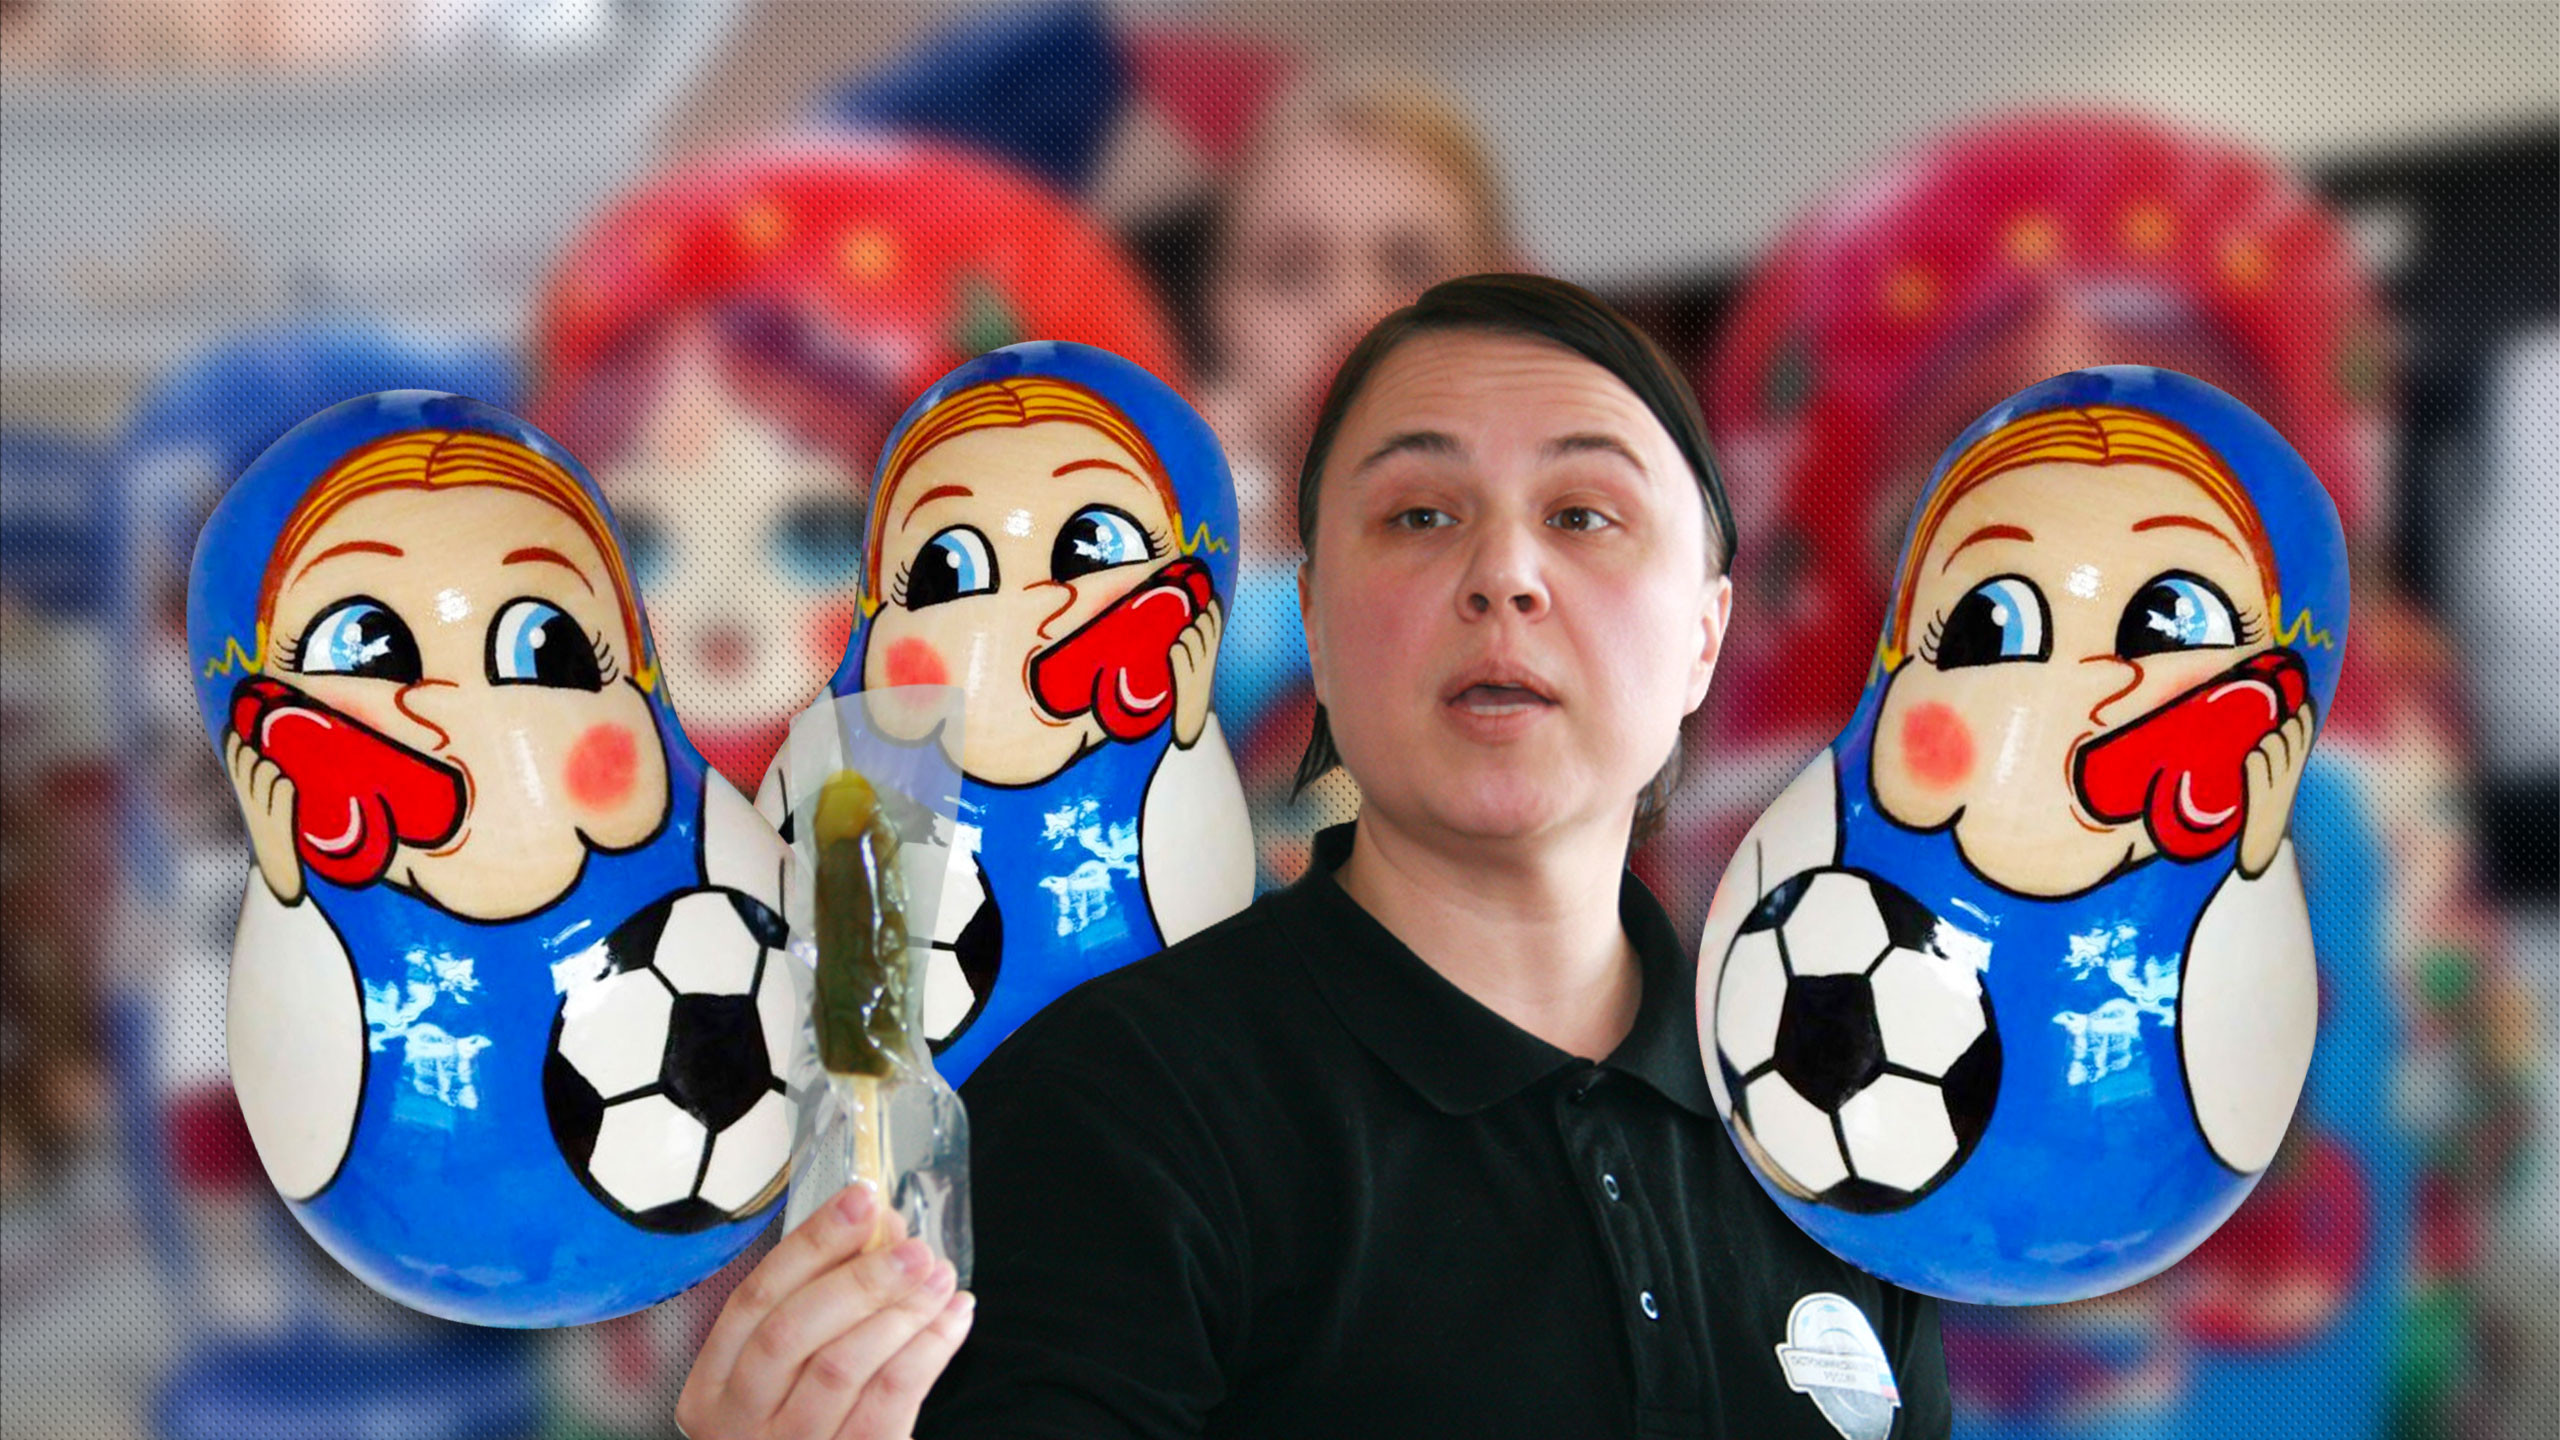 "<p><span>Фото: &copy; РИА Новости/Игорь Зарембо</span><span>, <a href=""https://zebra-tv.ru/novosti/chetvertaya-rubrika/ogurets-na-palochke/"" target=""_blank"">Зебра-ТВ</a>,&nbsp;instagram</span></p>"